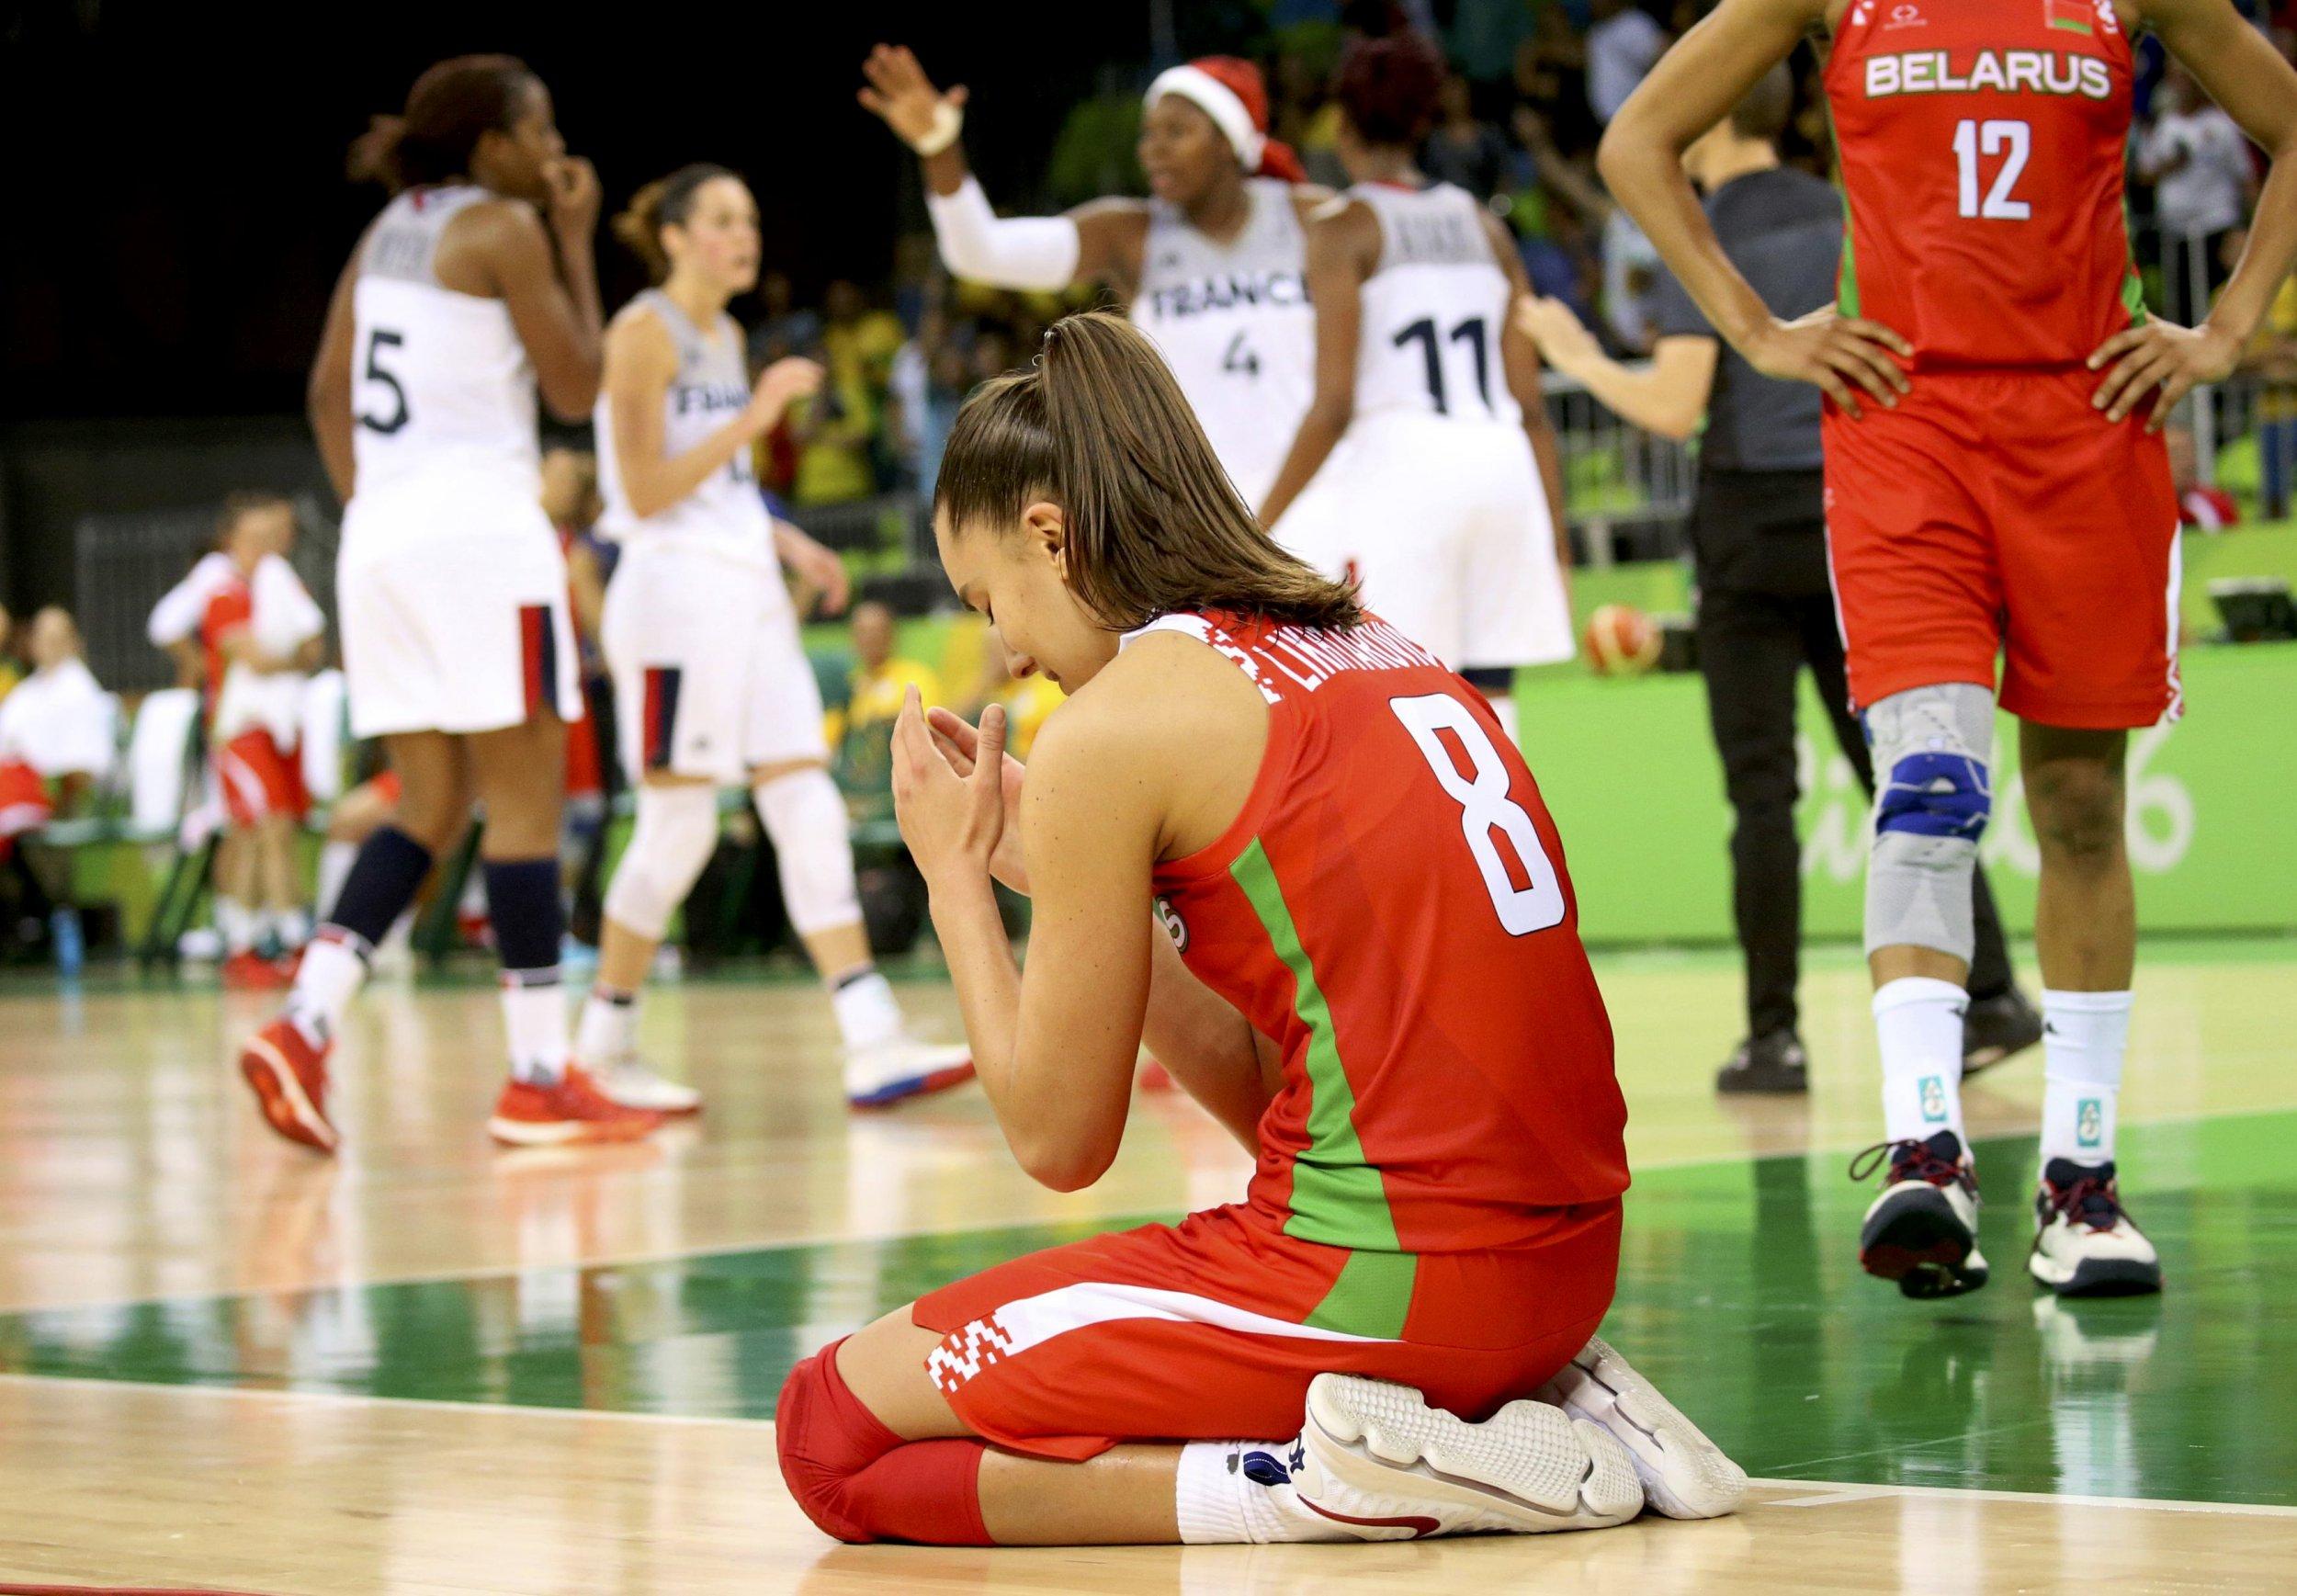 Belarus basketball player